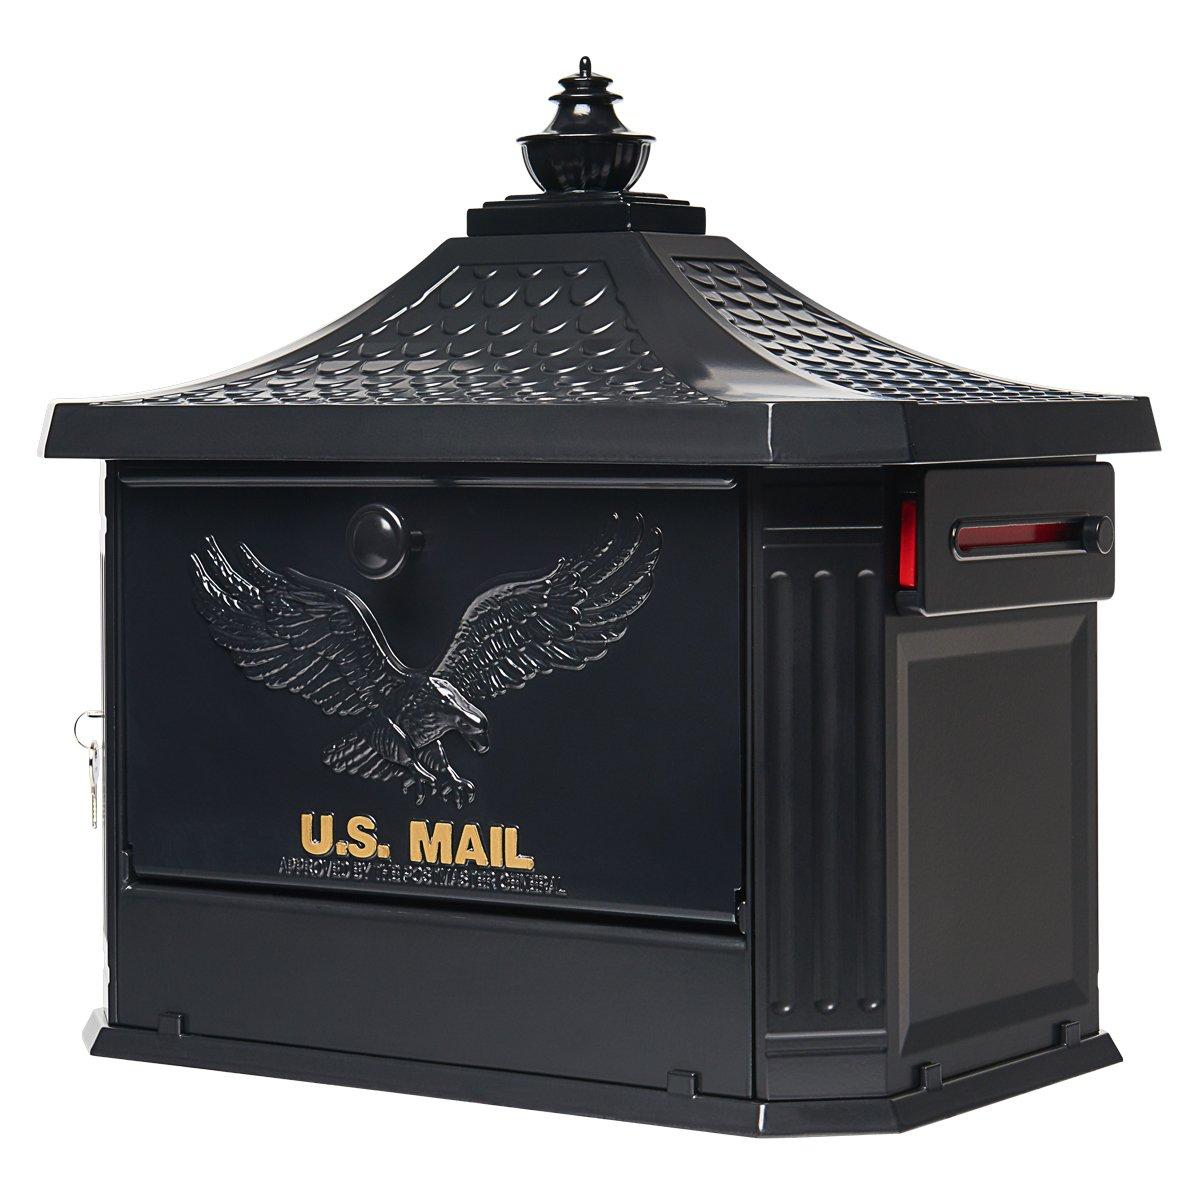 Gibraltar Mailboxes Hamilton Large Capacity Cast Aluminum Black, Post-Mount Mailbox, HM200B00 by Gibraltar Mailboxes (Image #1)